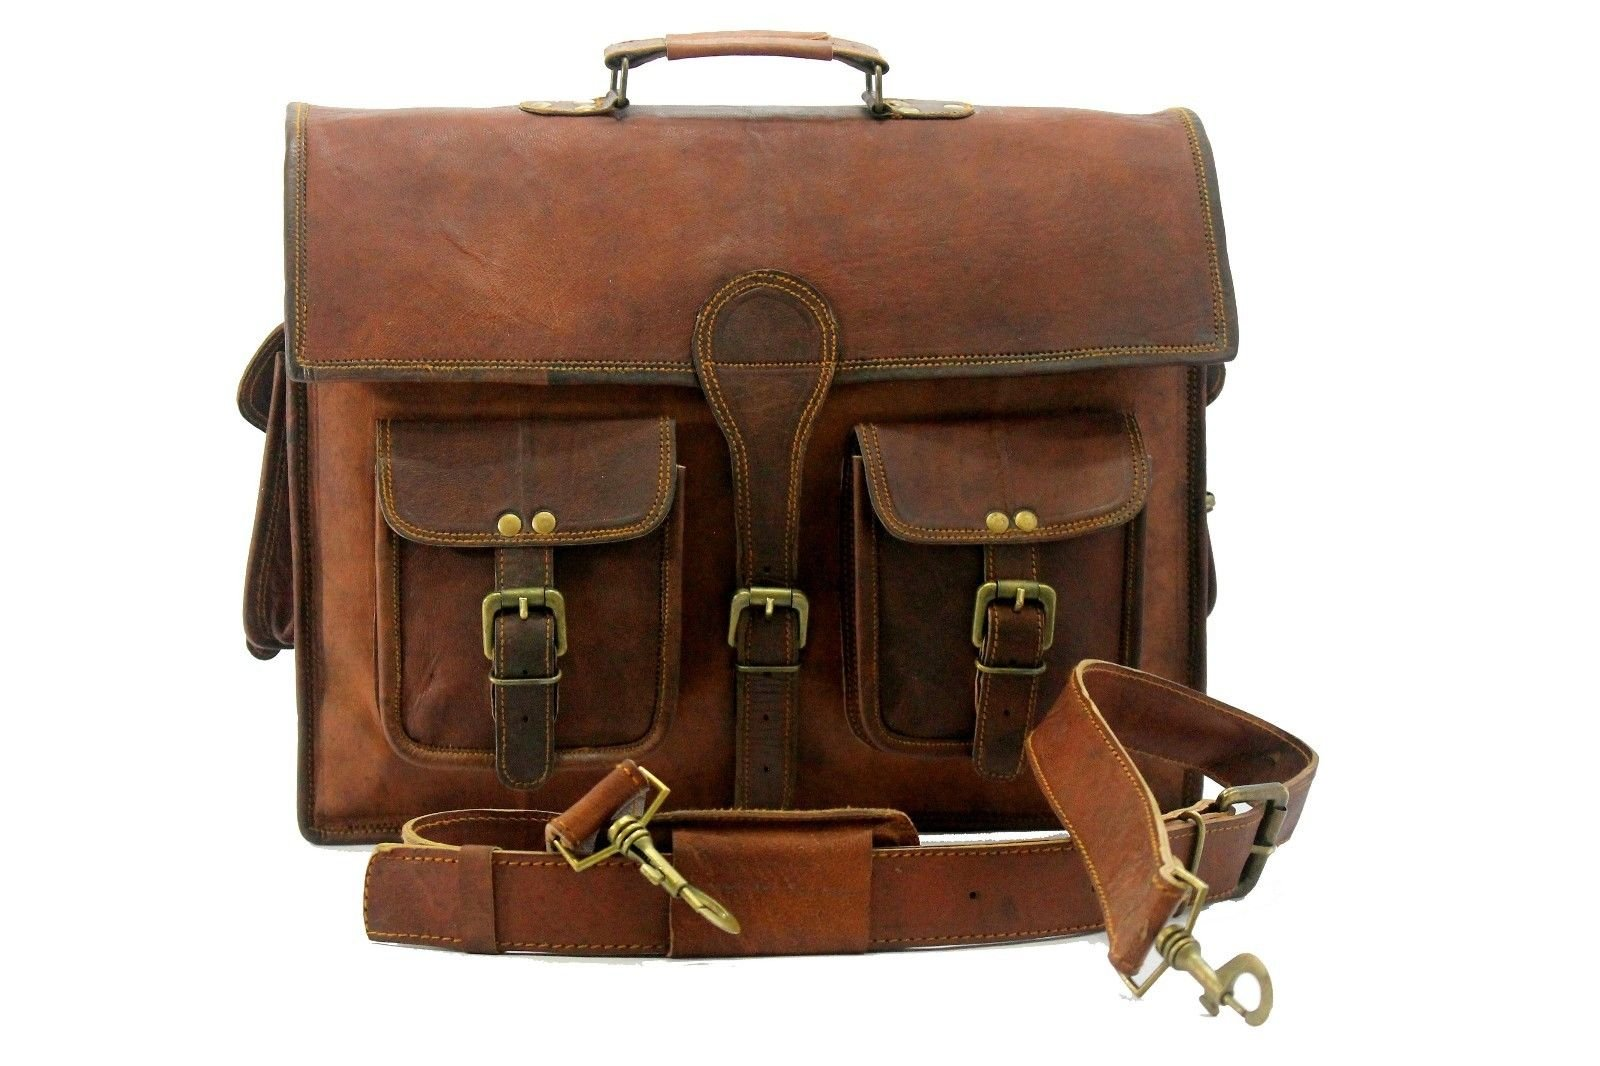 Shivam 15 Inch Handmade Leather Bag Office Bag Laptop Bag Satchel Messenger Bag